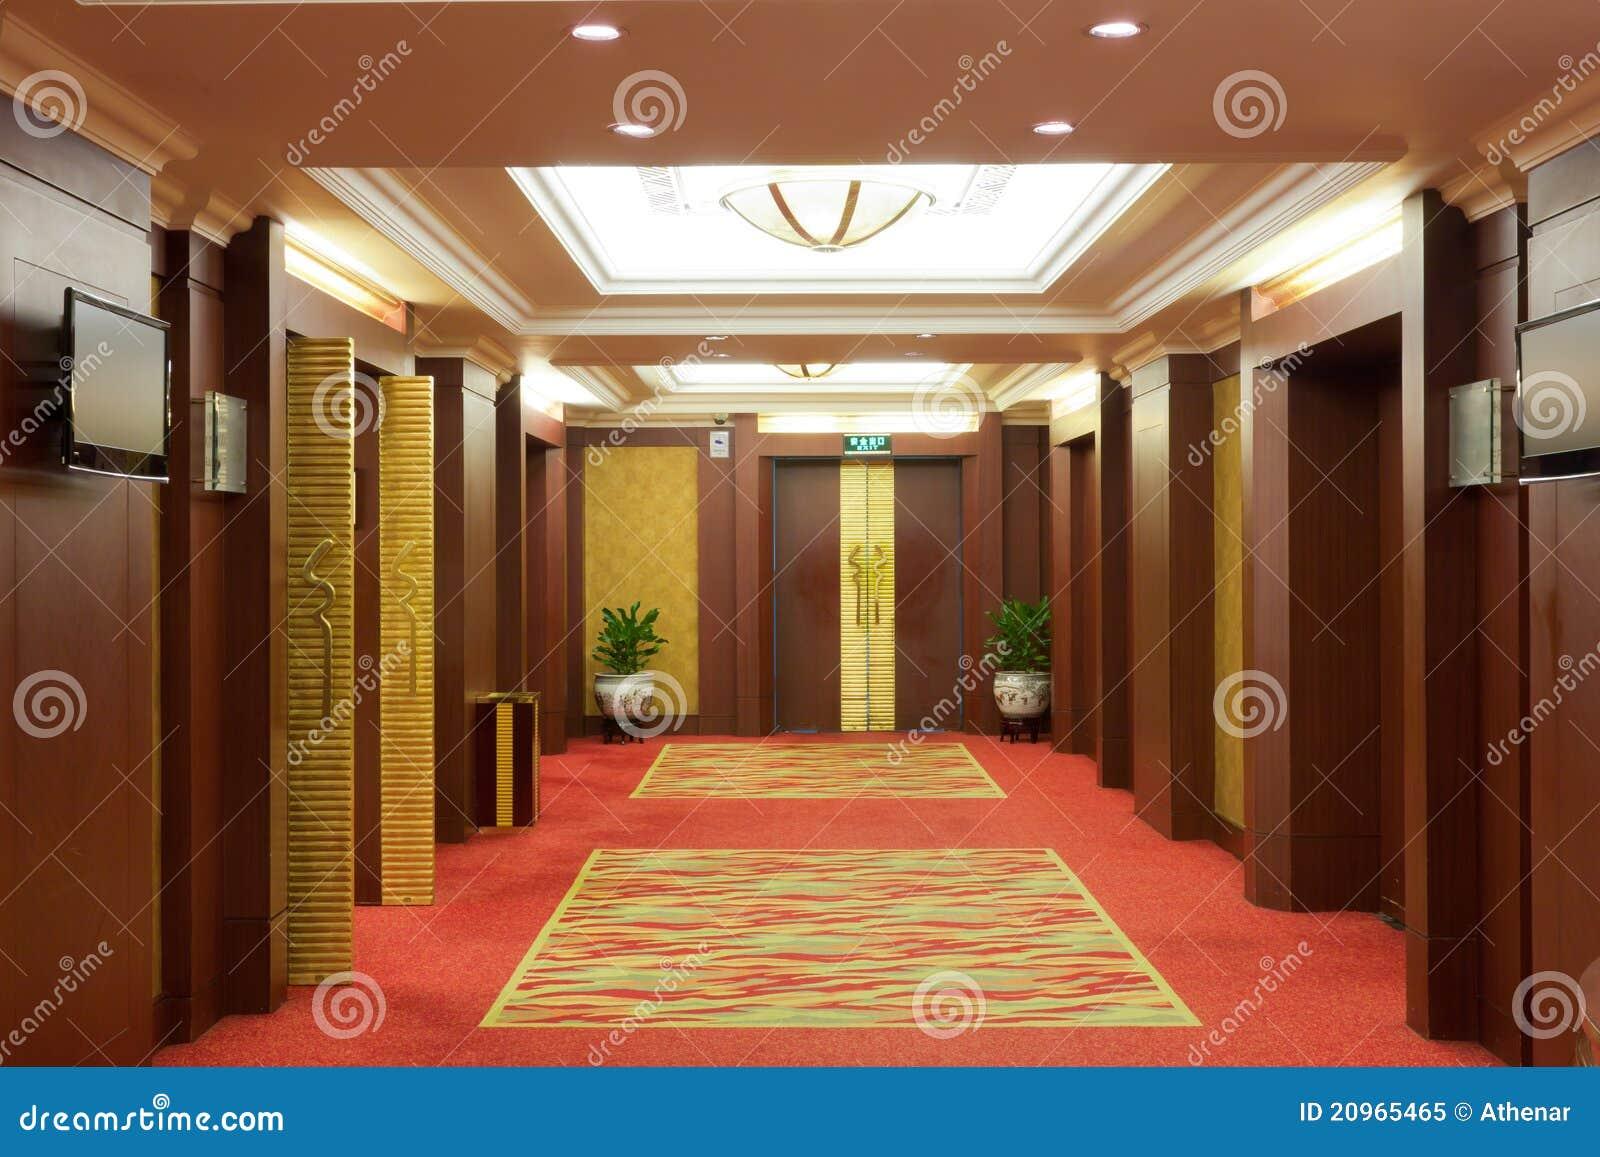 Interior Do Corredor Do Hotel De Luxo Foto de Stock Royalty Free  #3B190C 1300x957 Banheiro De Hotel De Luxo